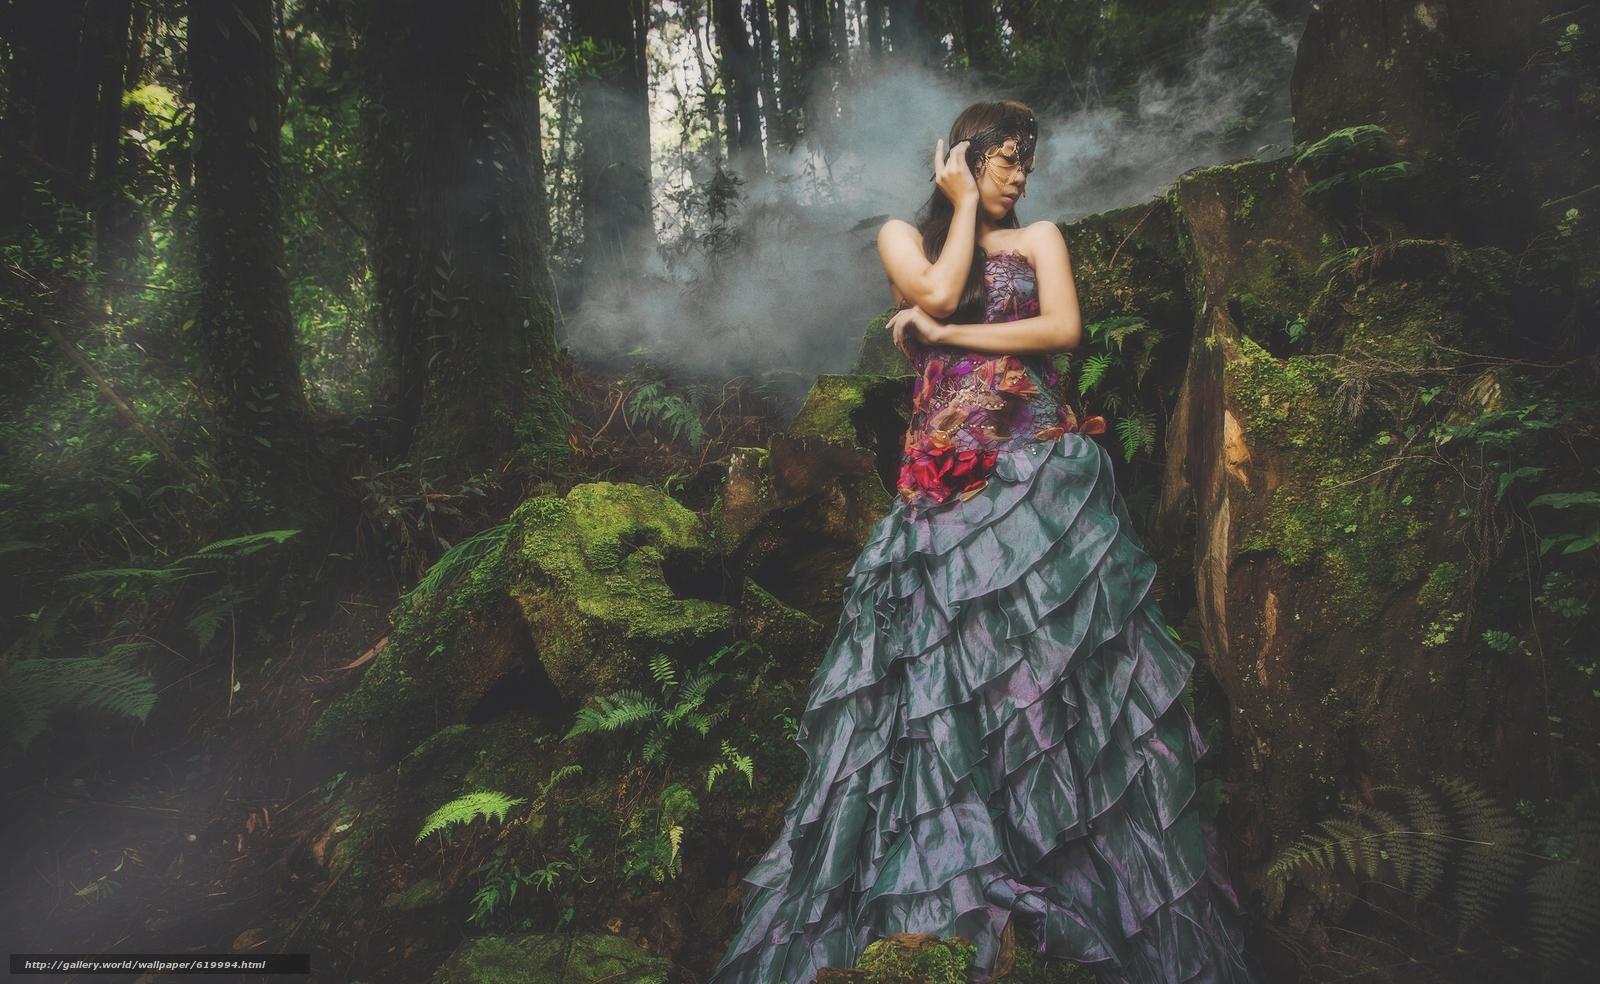 азиатка, платье, маска, лес